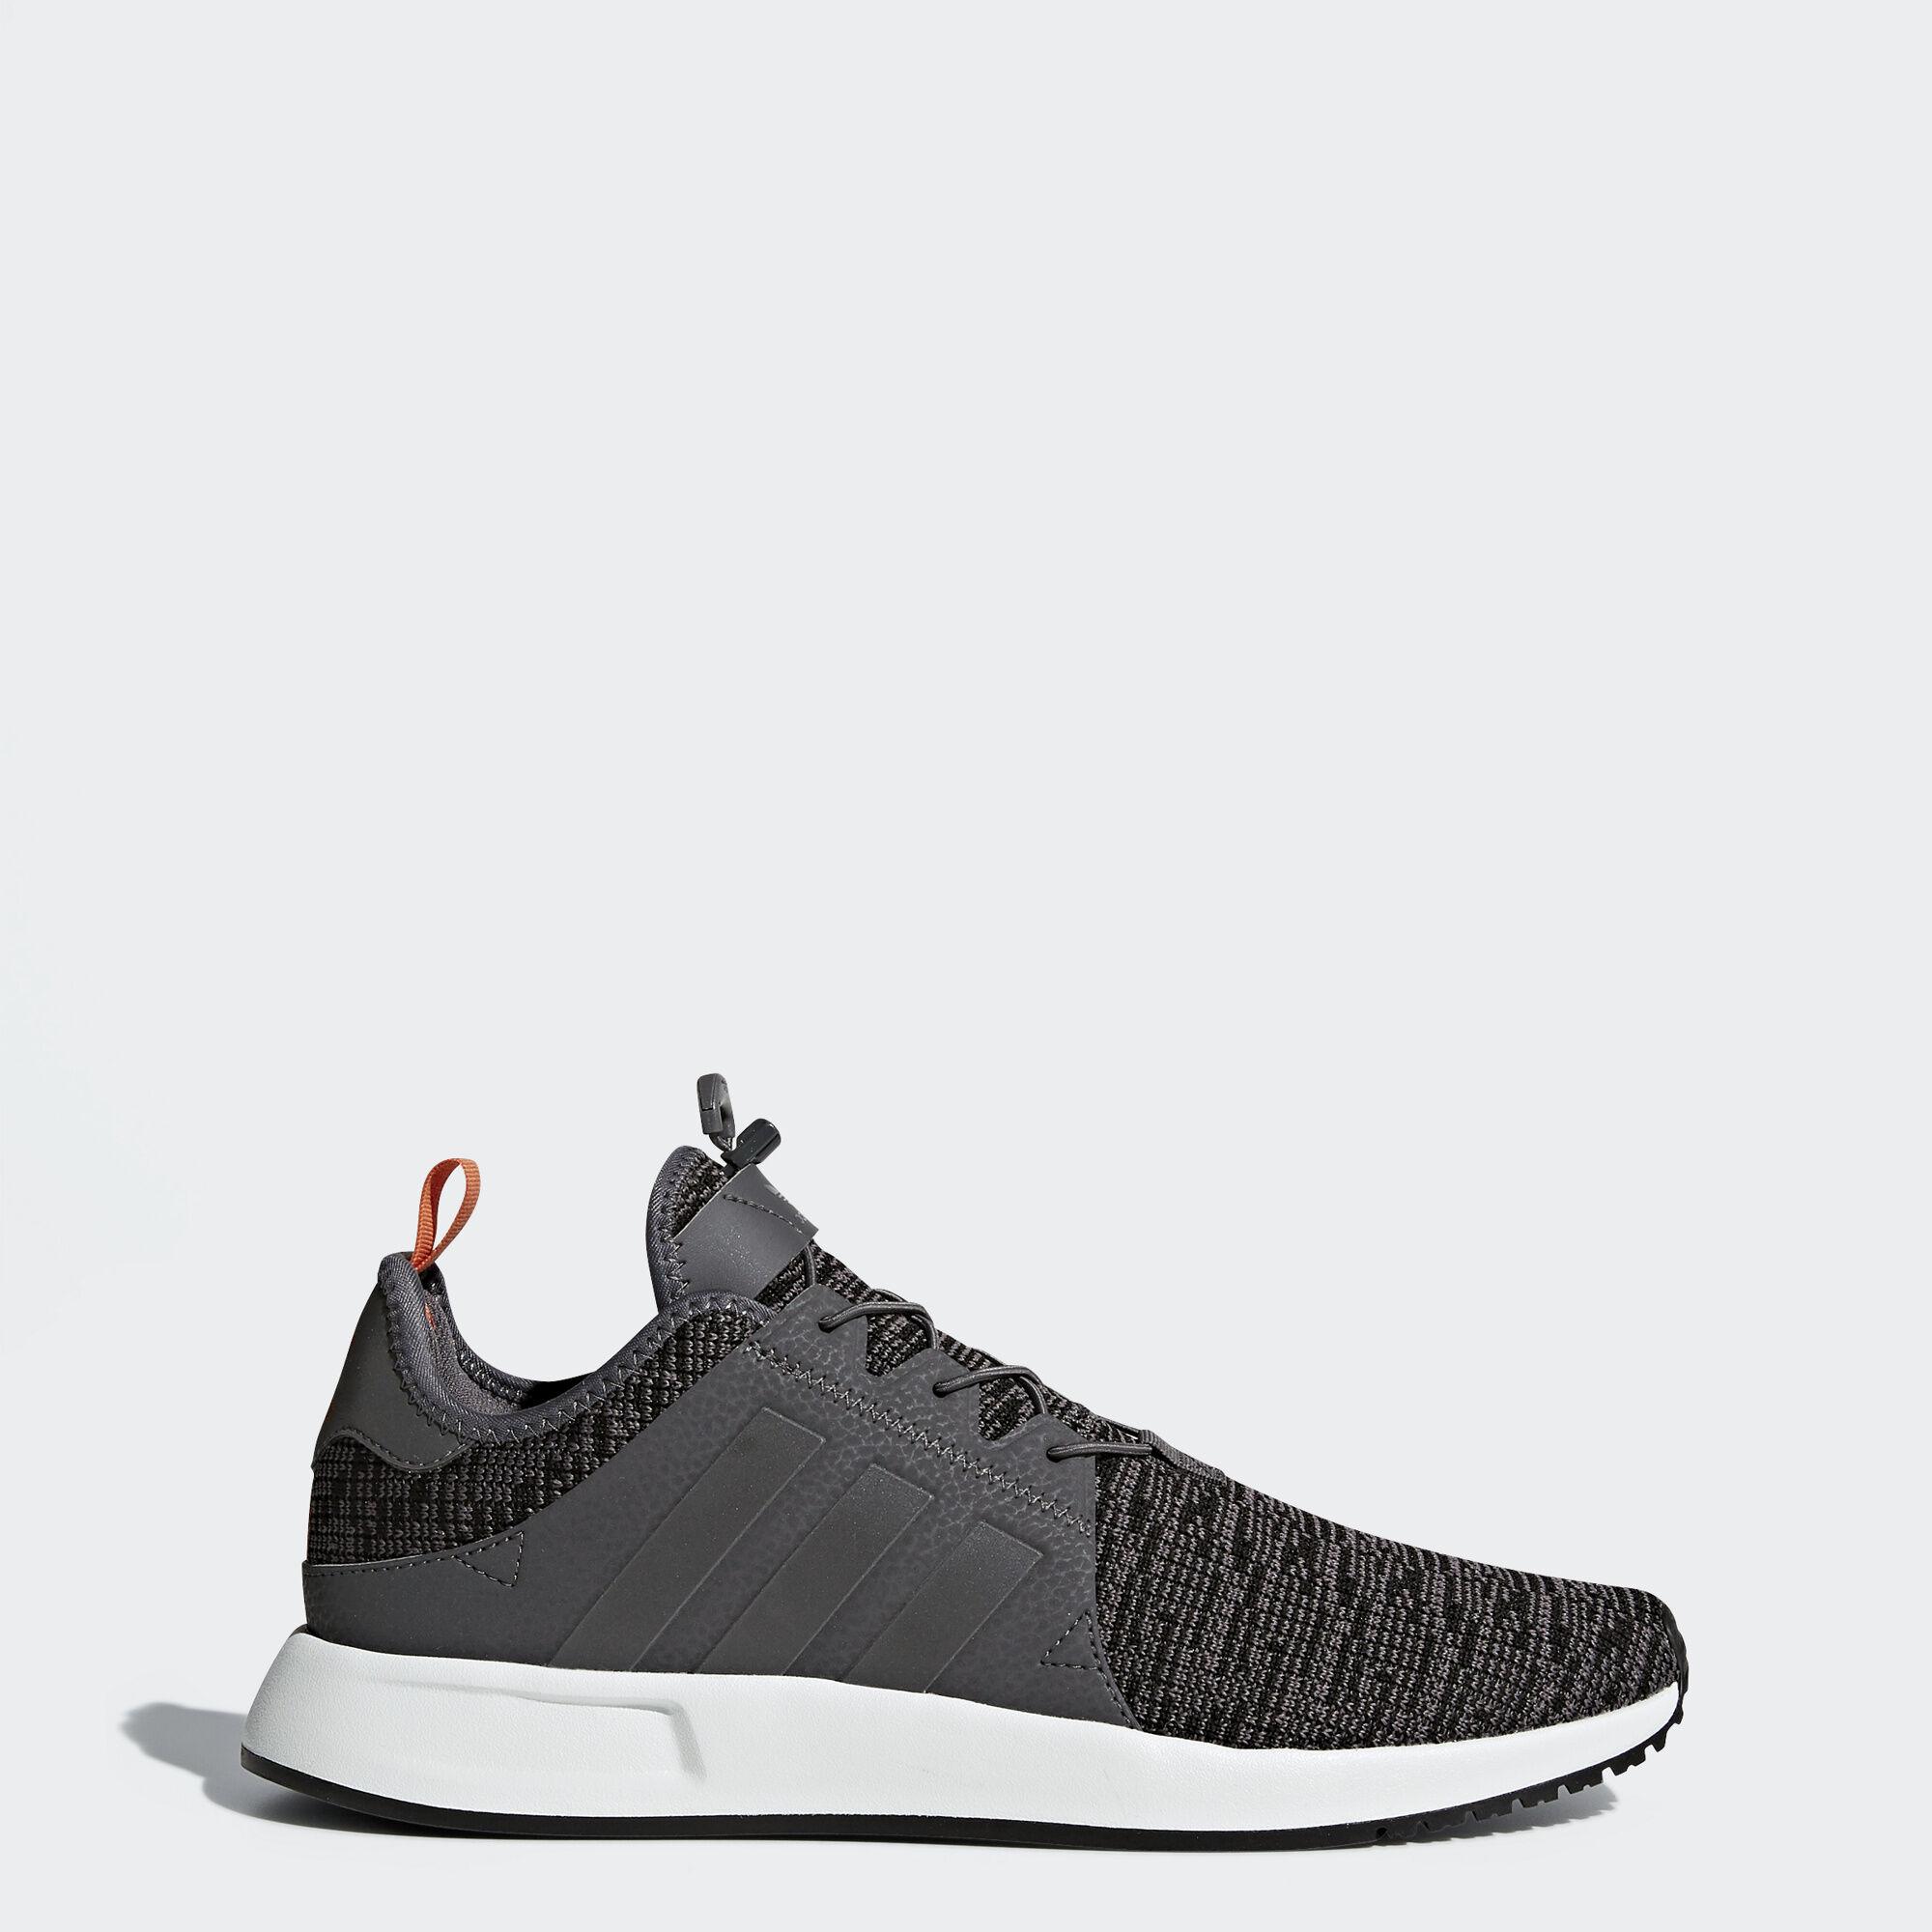 Adidas Neo CLOUDFOAM SUPER SKATE Sneakers Buy CBLACK